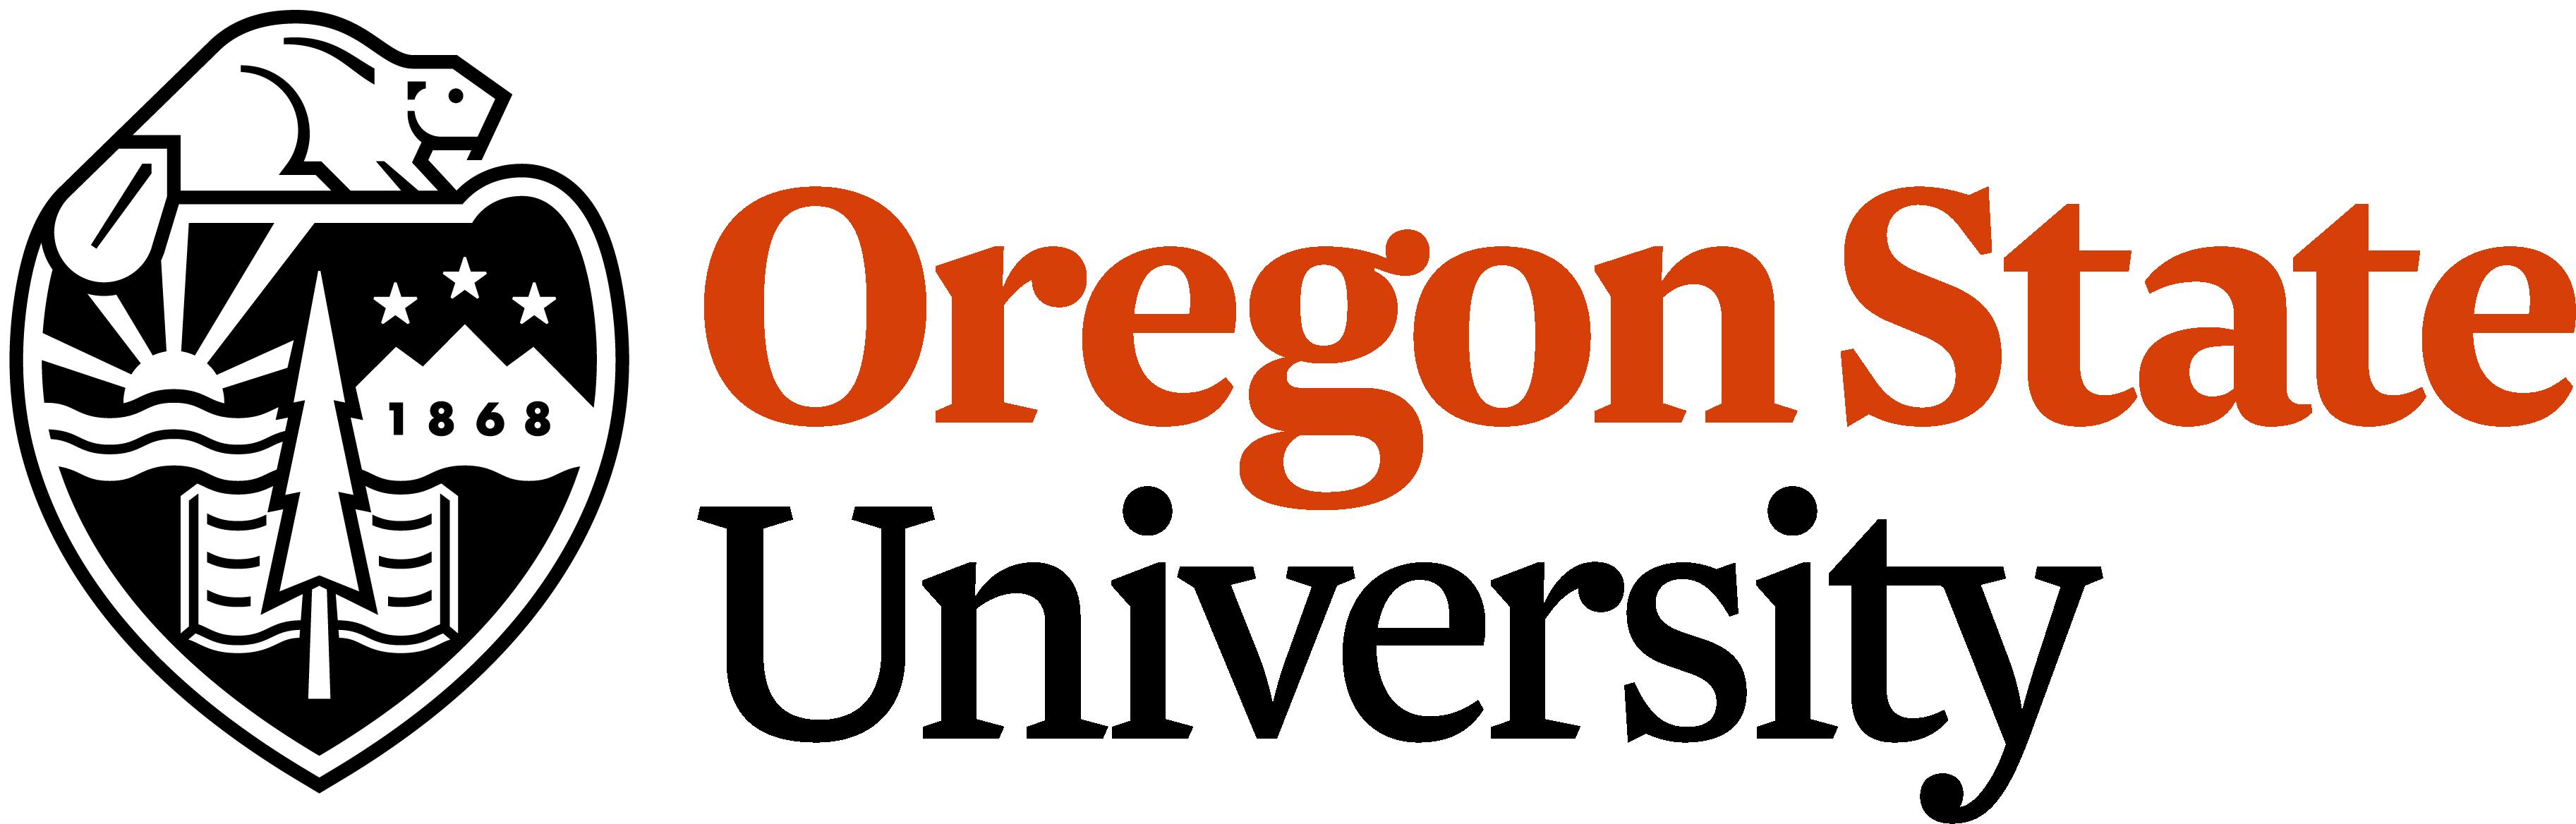 The Oregon State University logo.